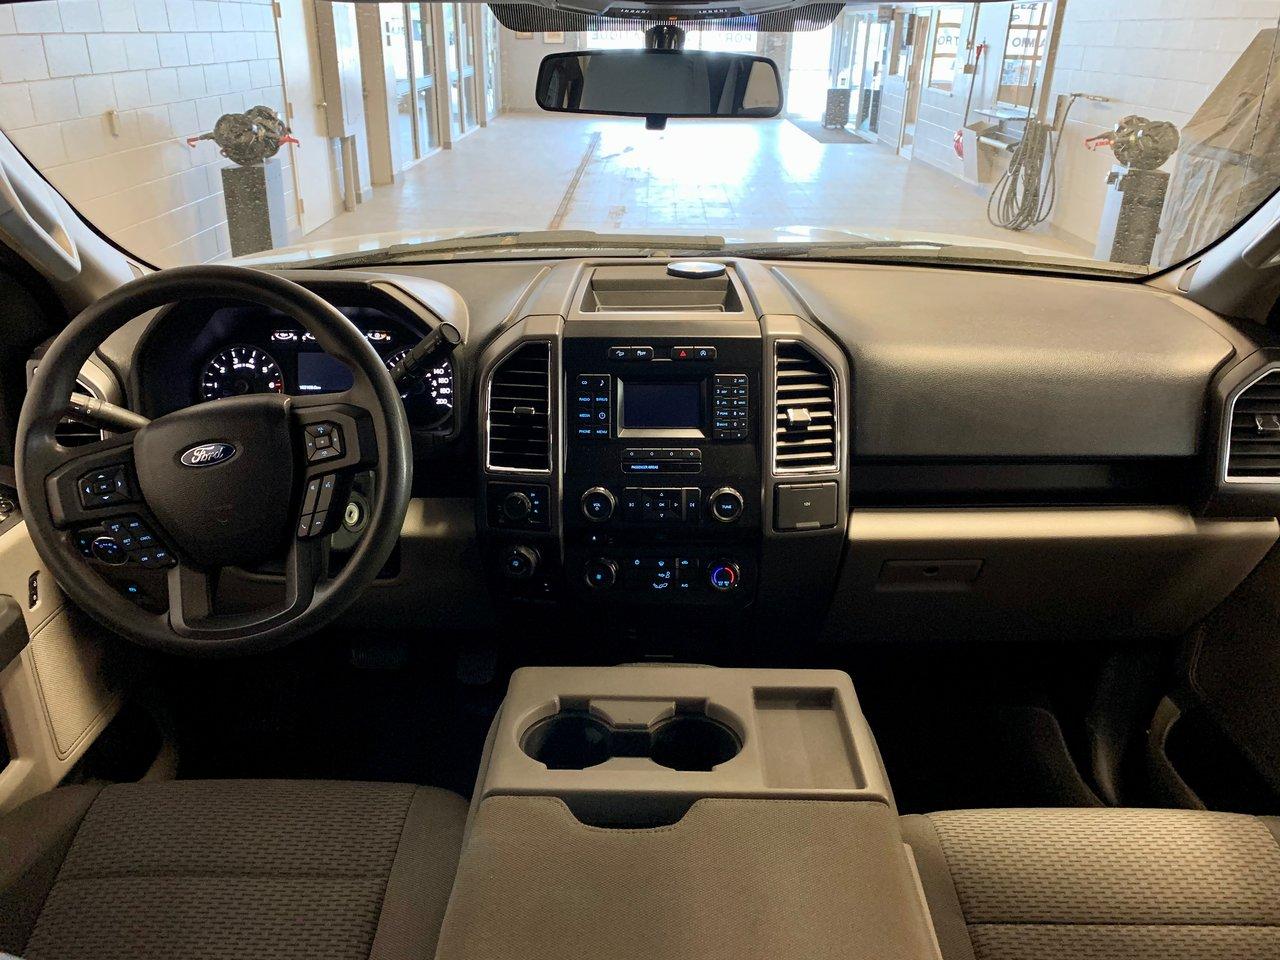 2016 Ford F-150 XLT 300A 4X4 / 2.7L ECO + 3.55 DIFF + 5.5 BOITE